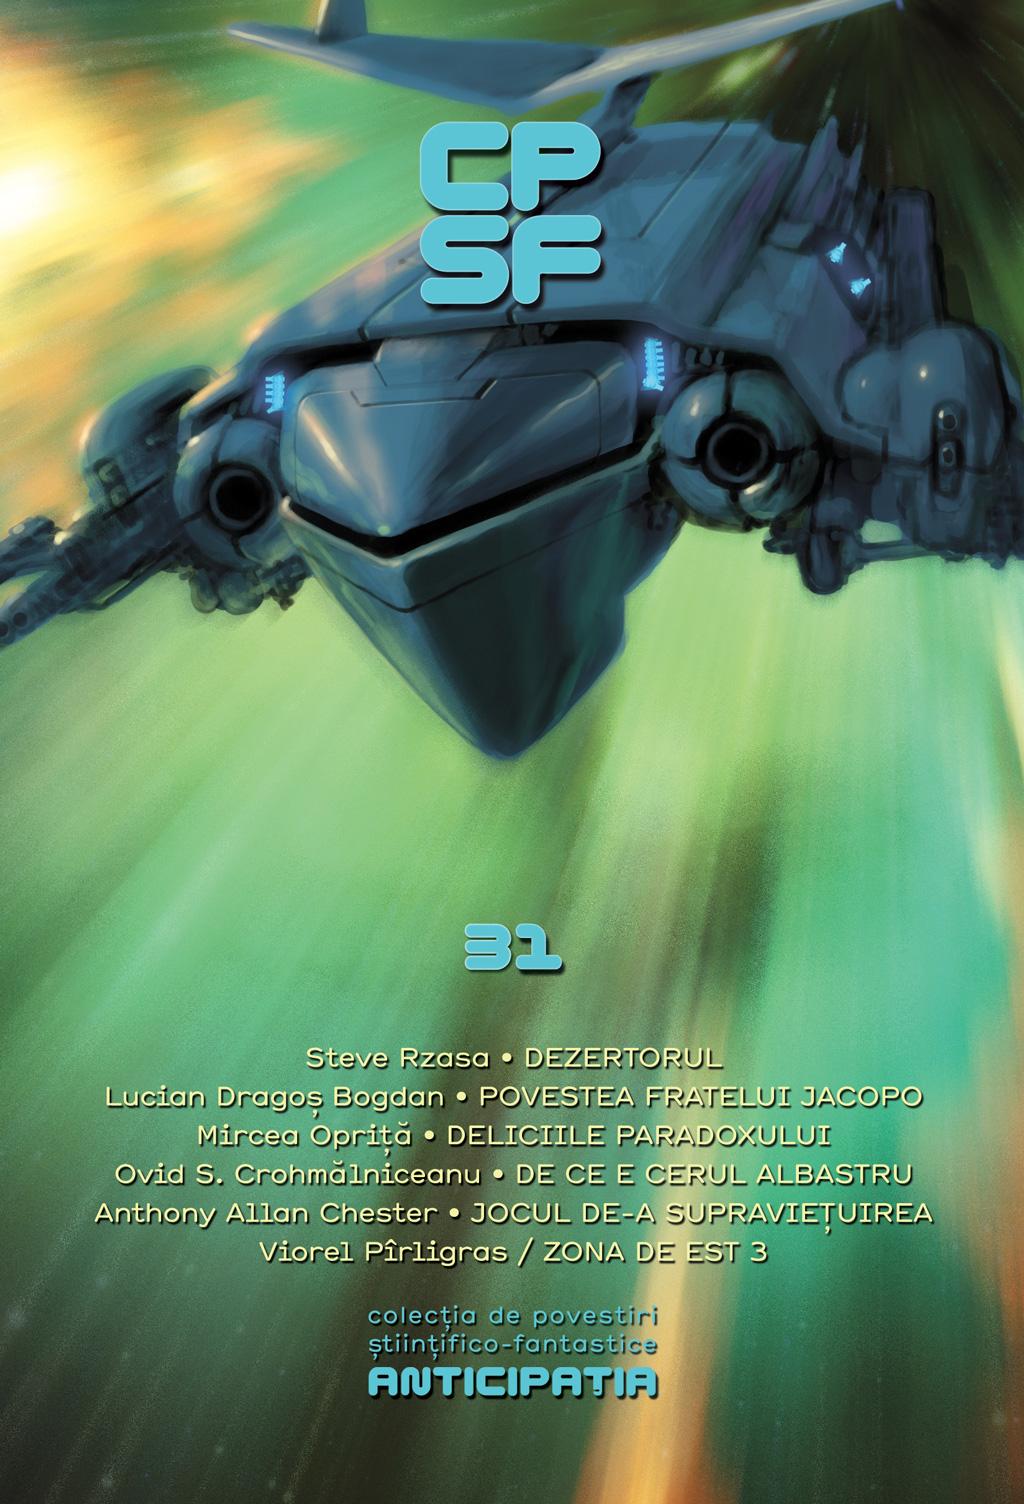 Colectia de Povestiri Stiintifico-Fantastice (CPSF) Anticipatia Nr.31